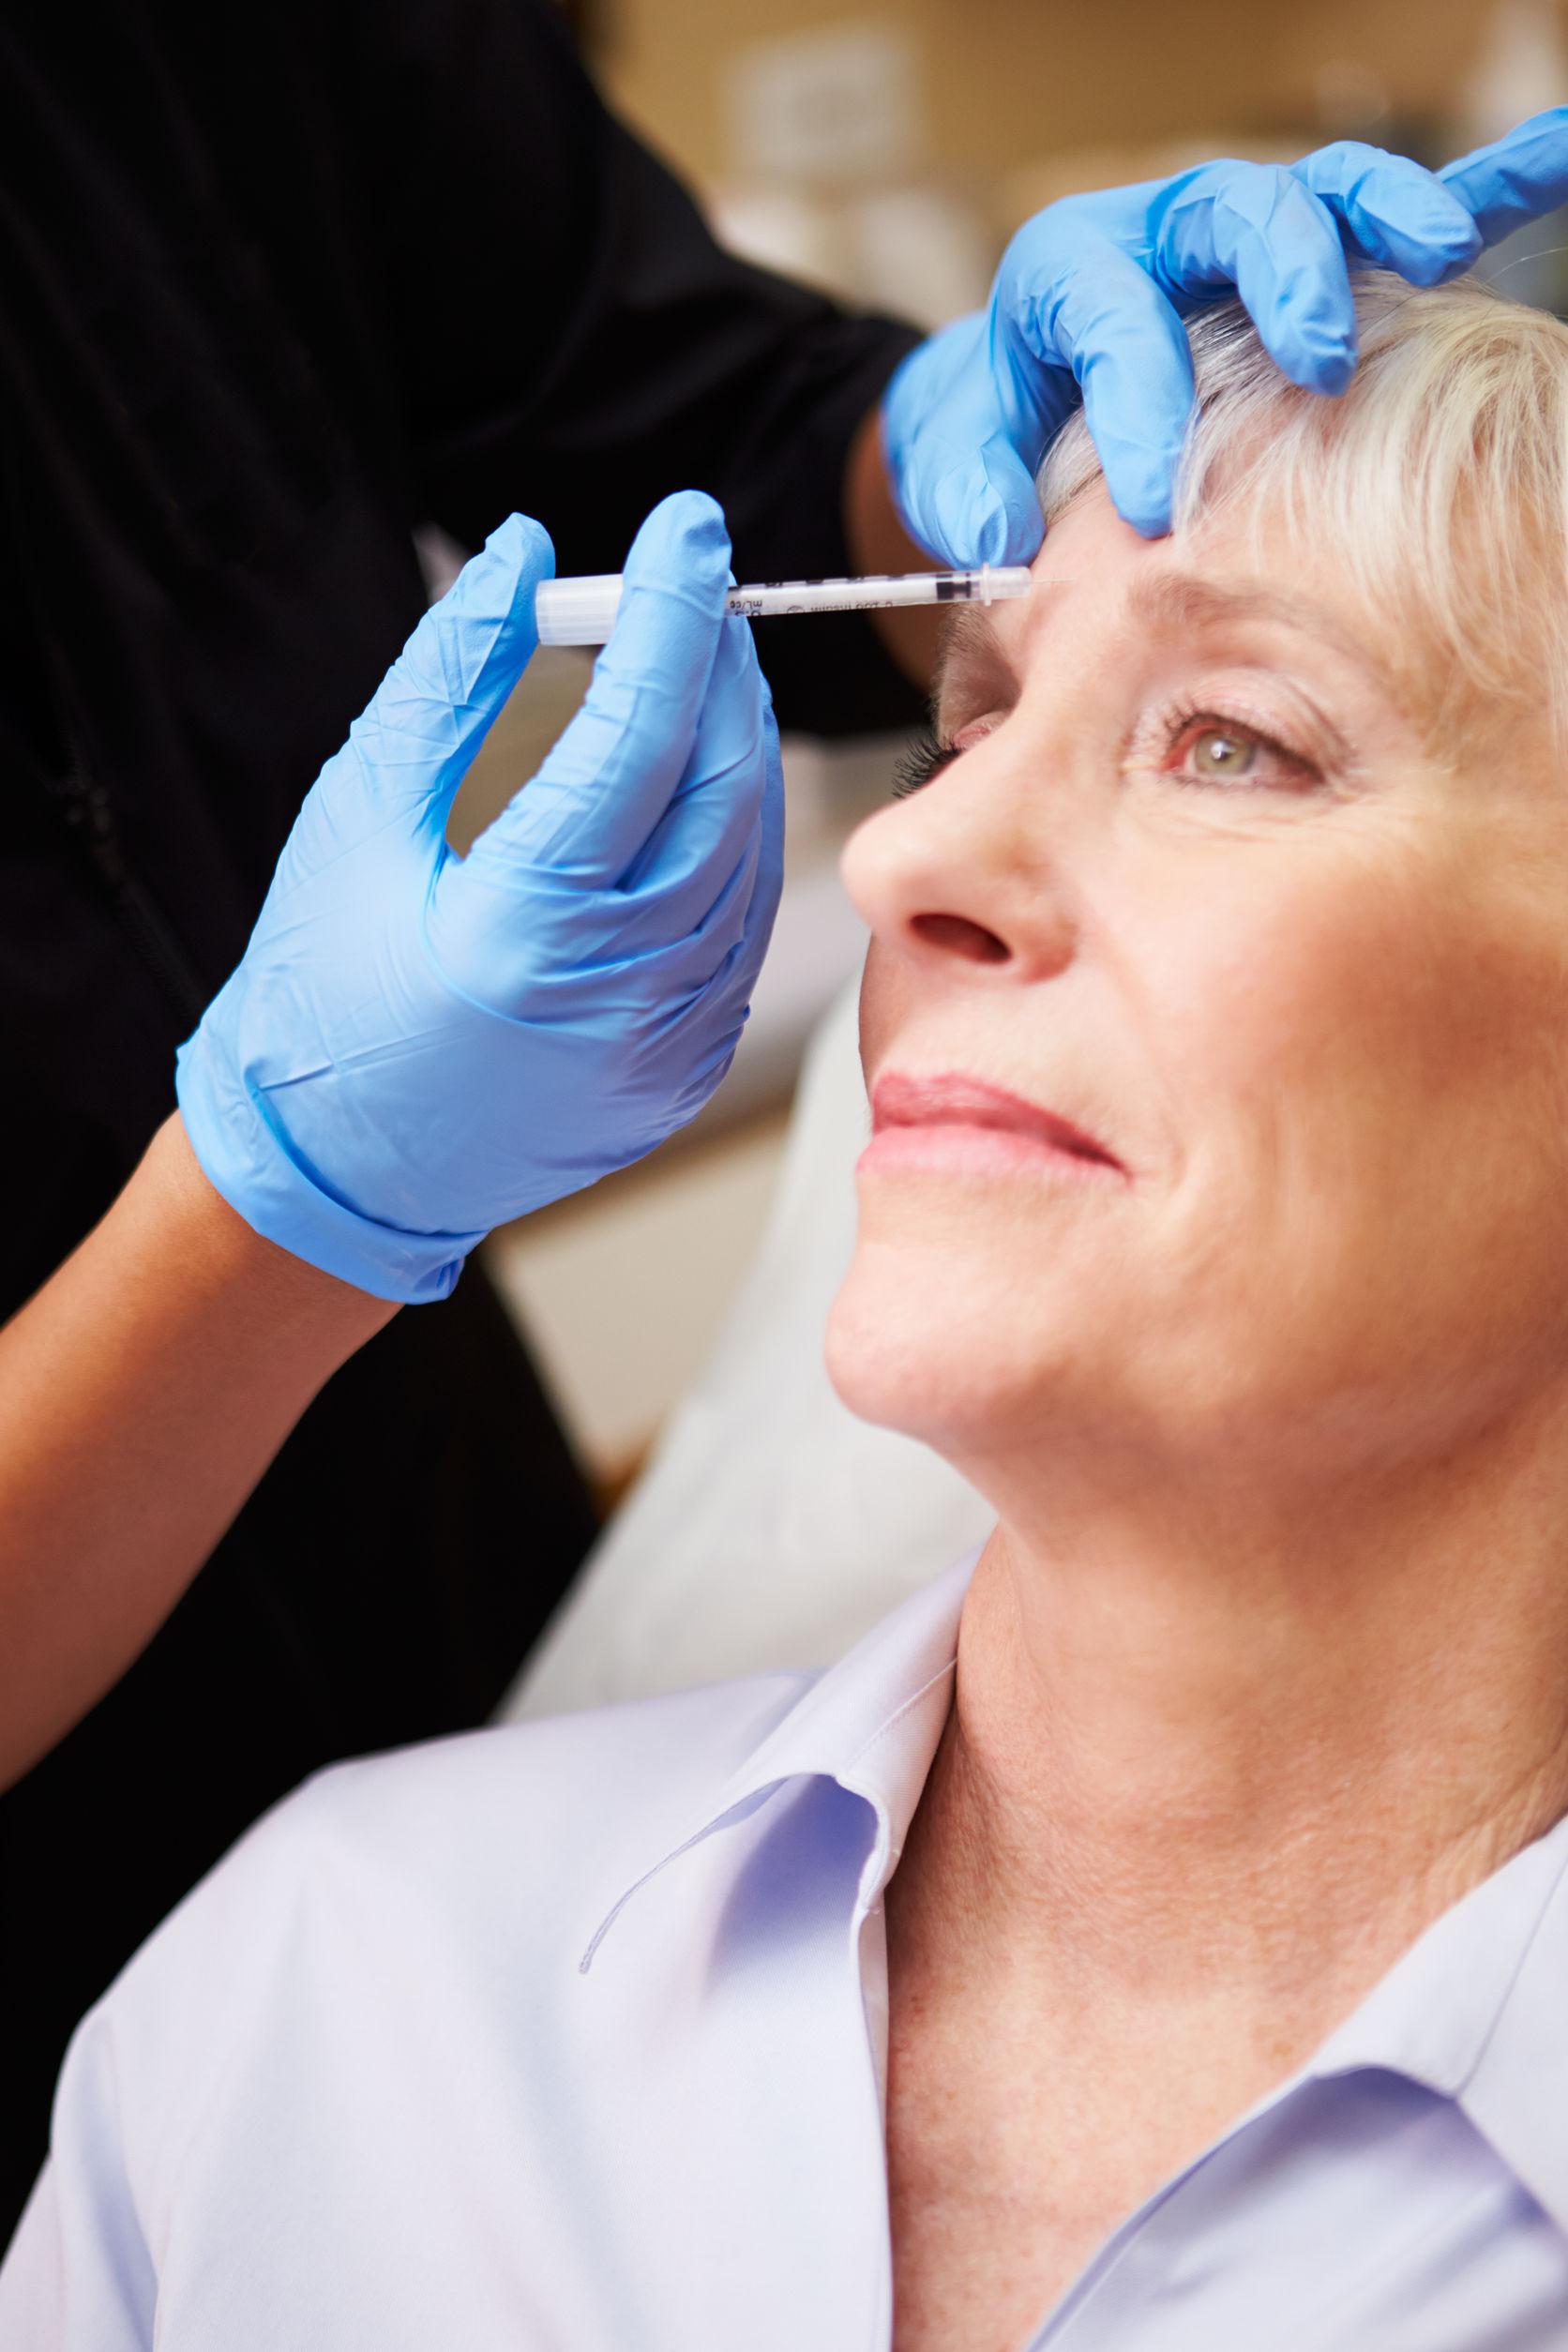 Toxina botulínica (Botox)